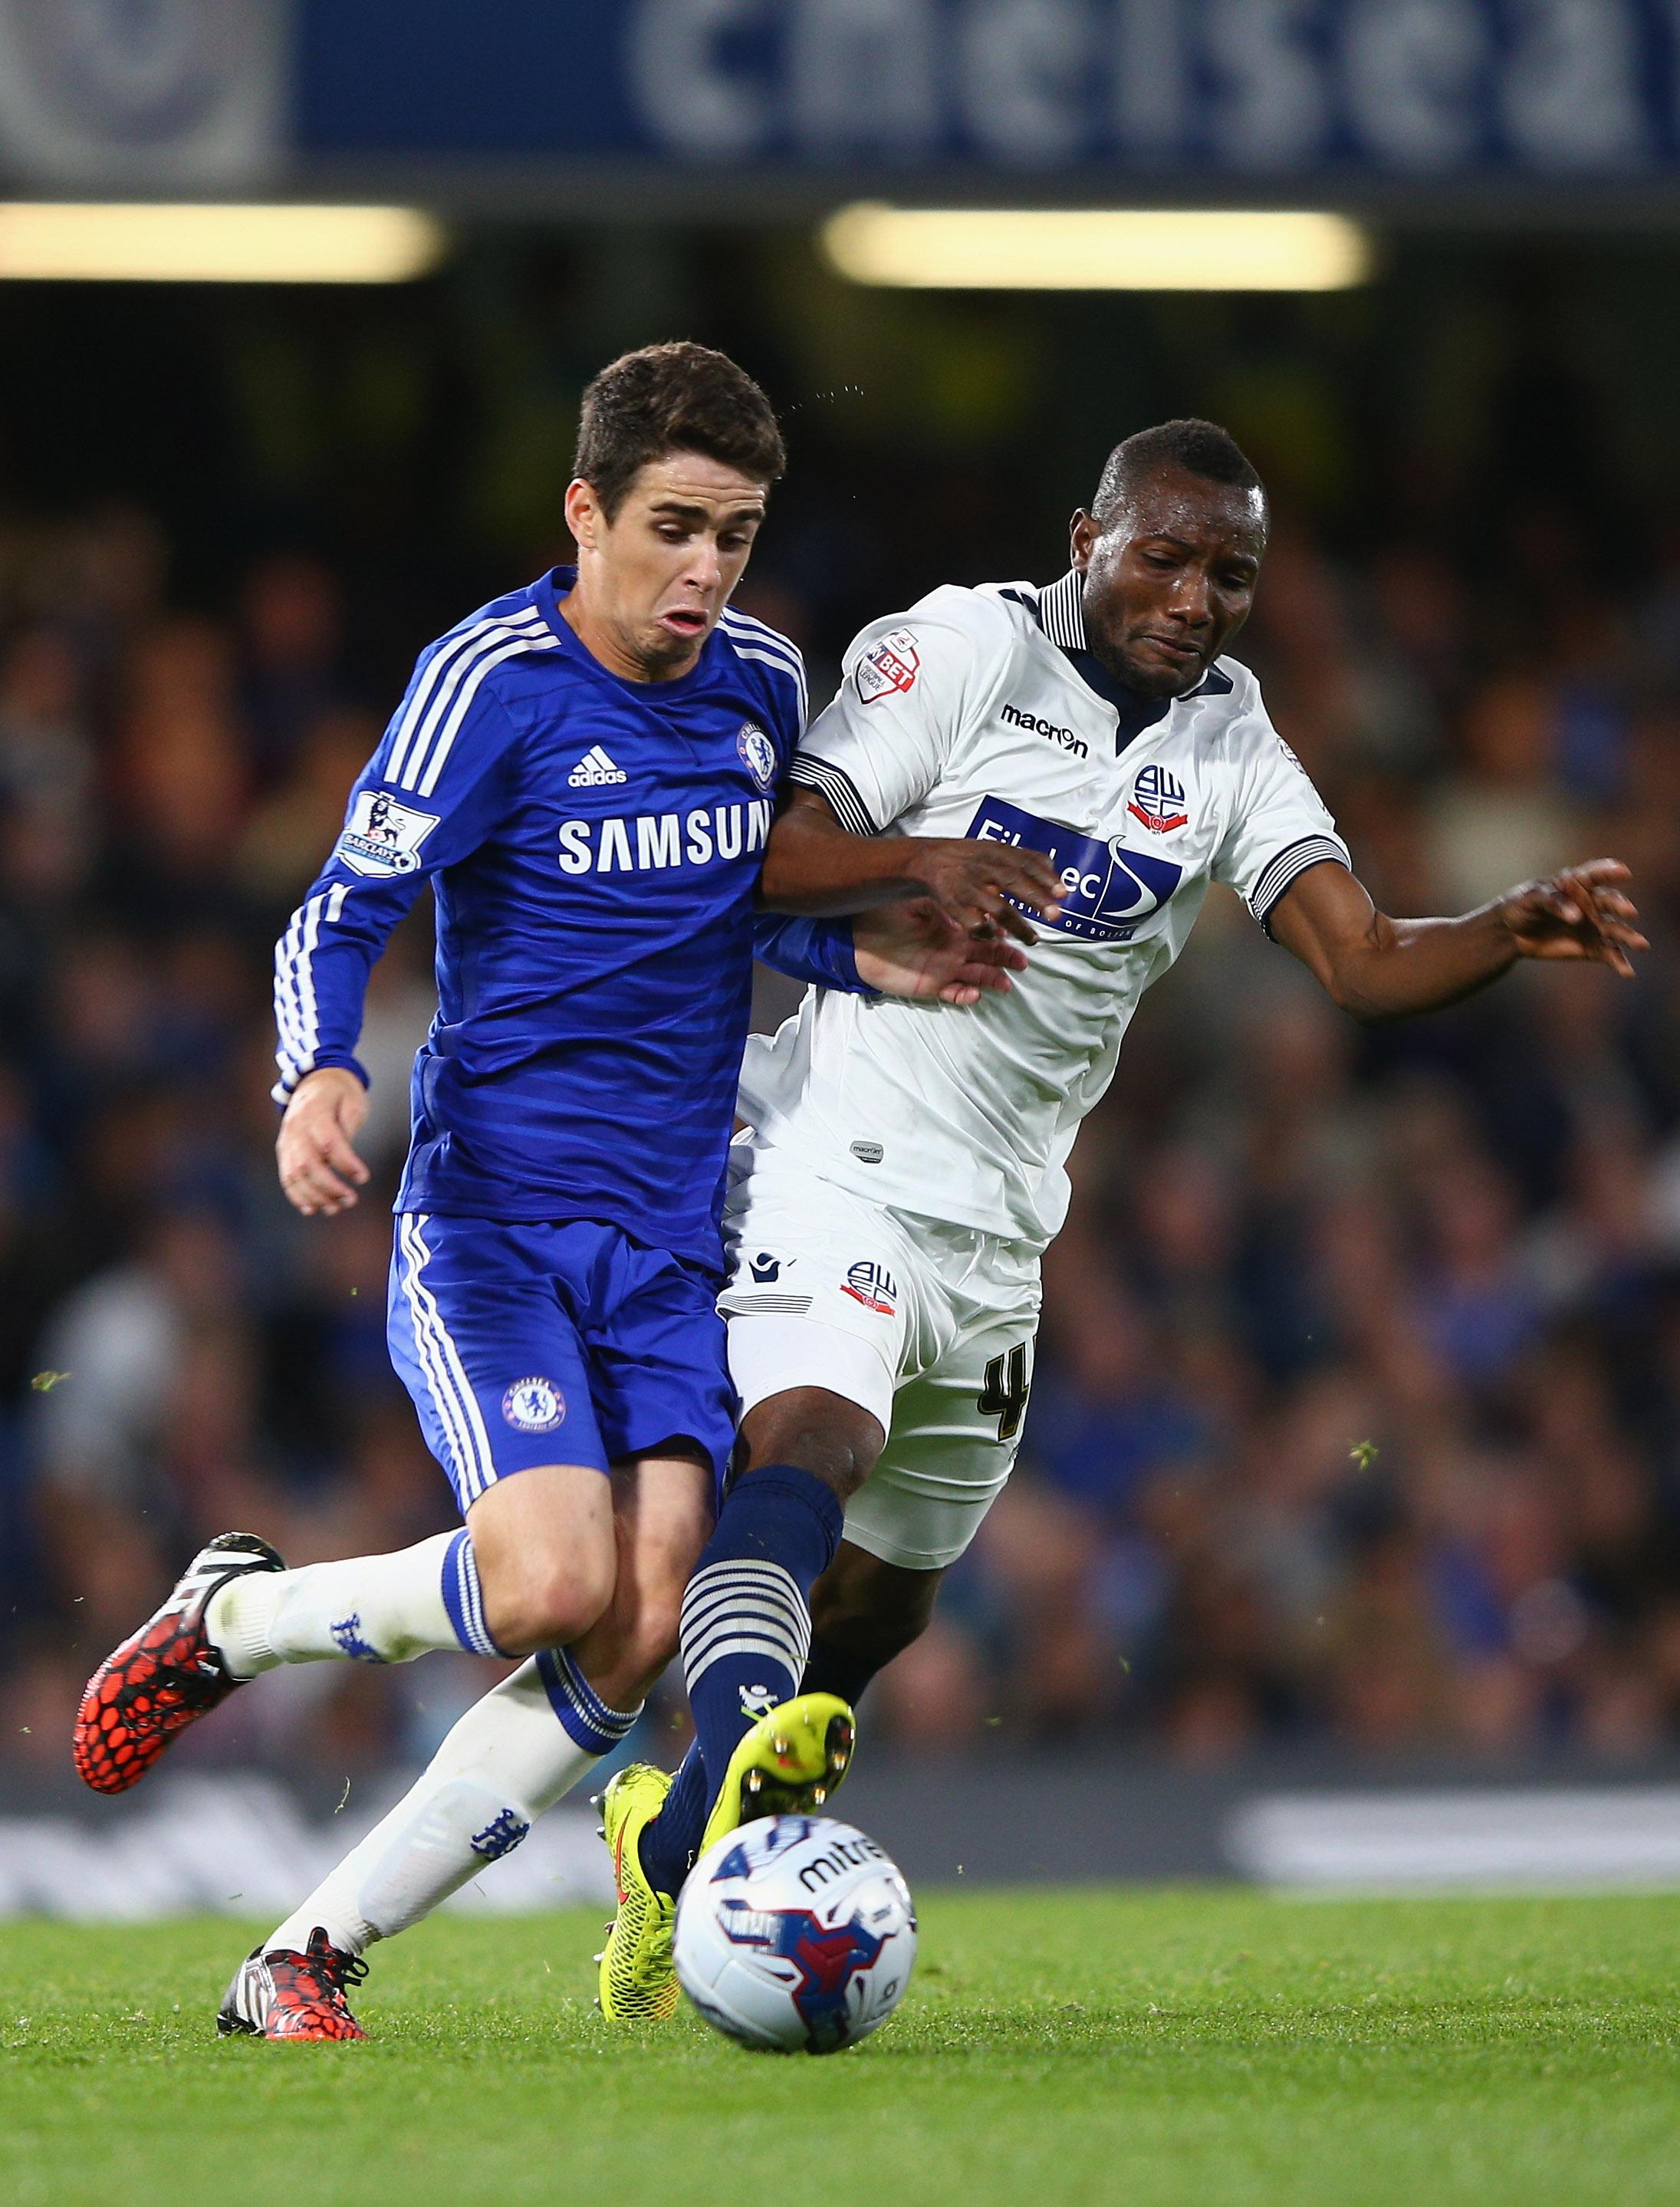 Kamara in action against Chelsea earlier on this season.